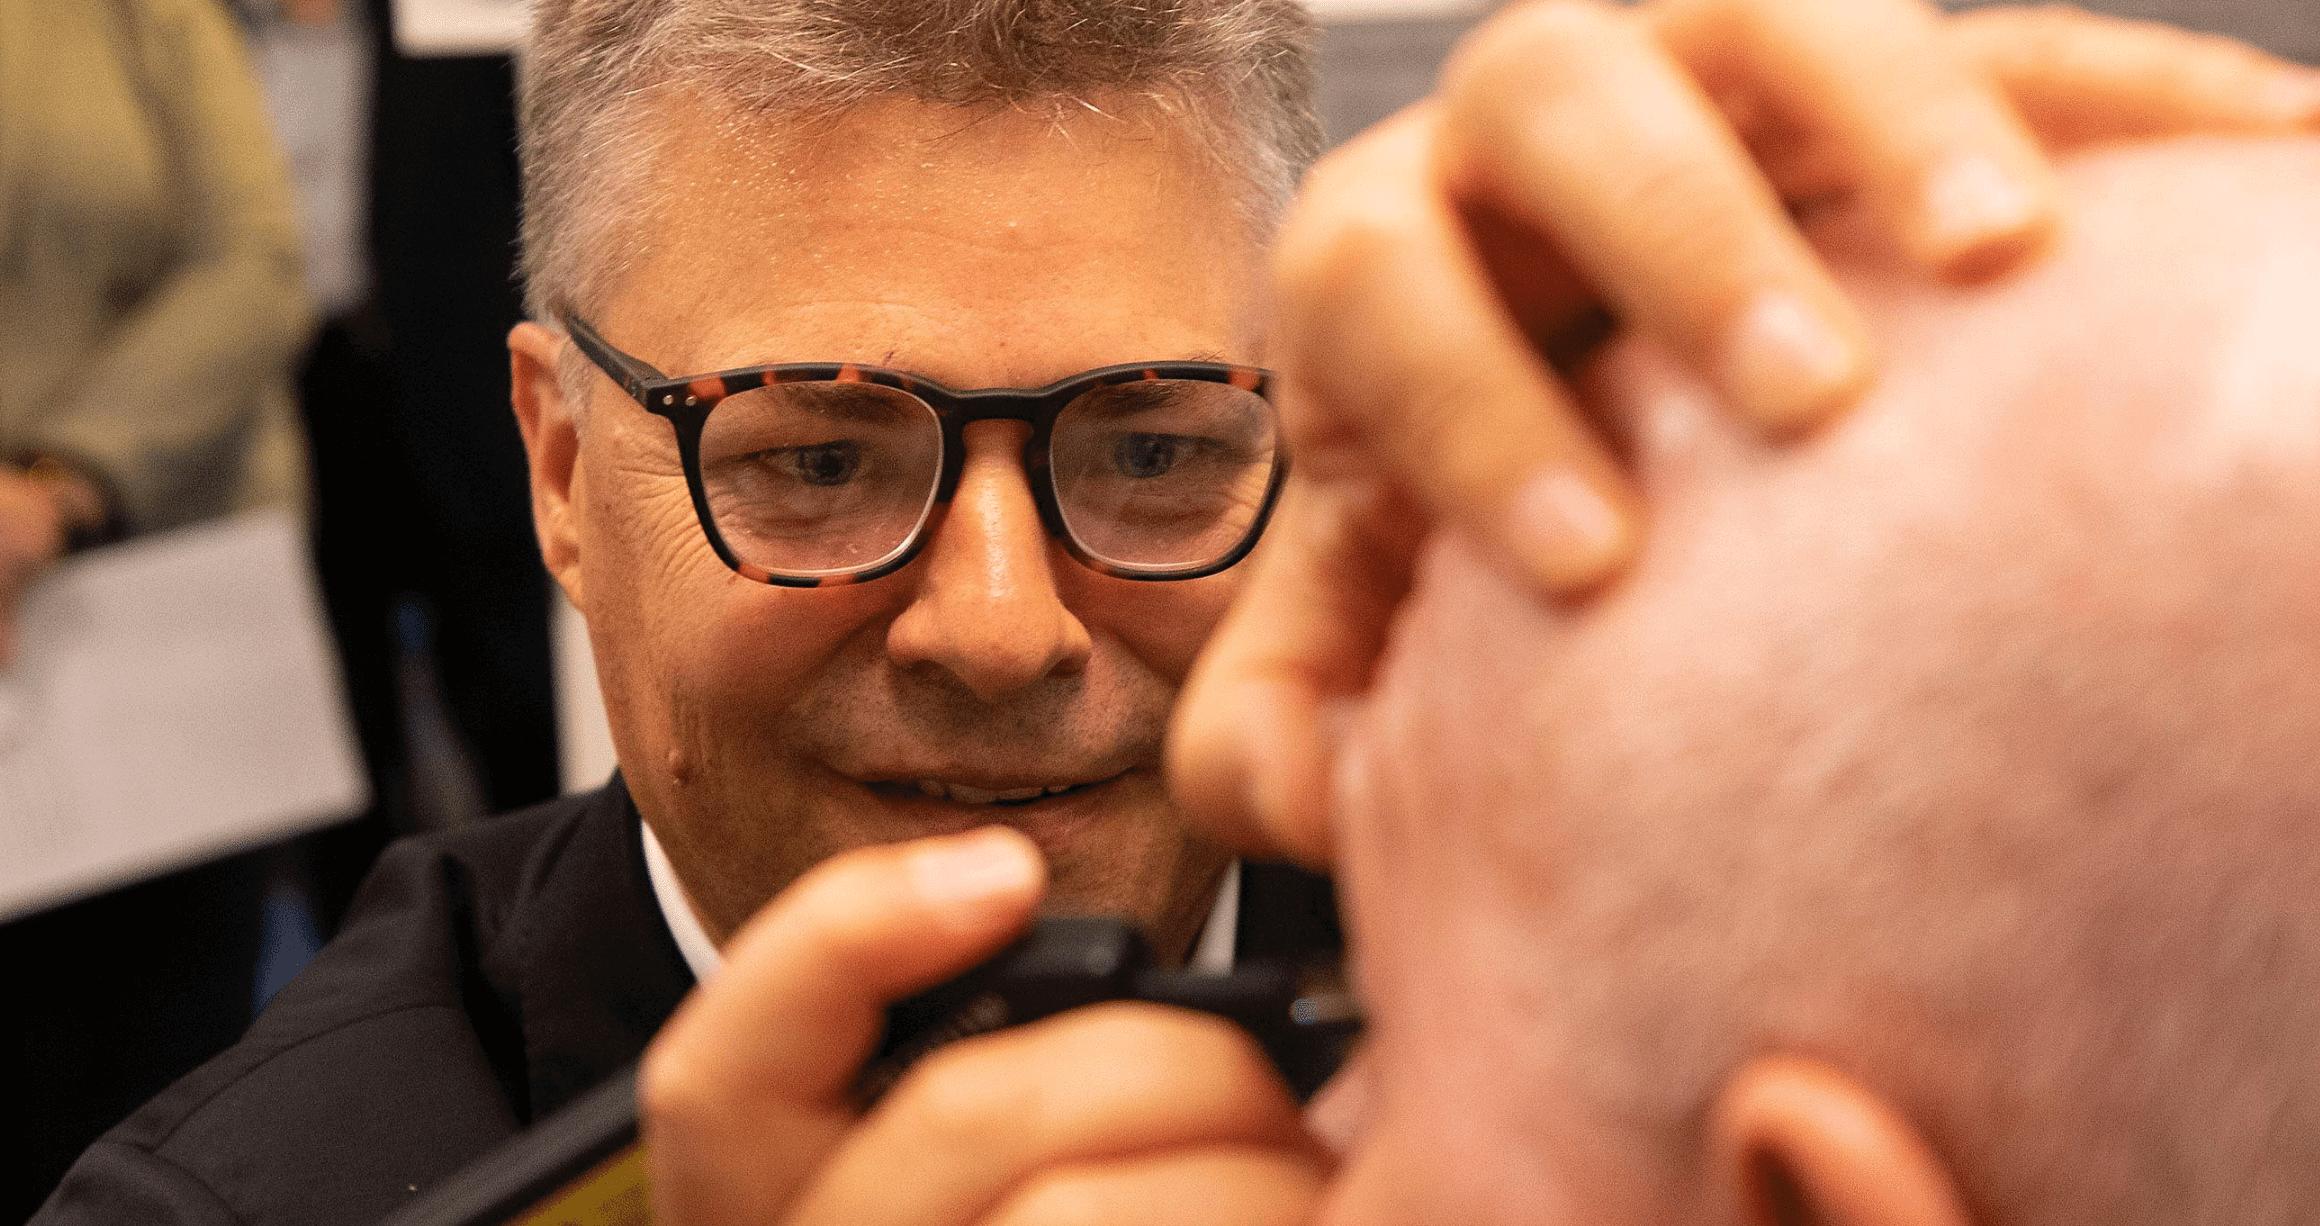 Prof Jamie Craig, examining a patient's eyes